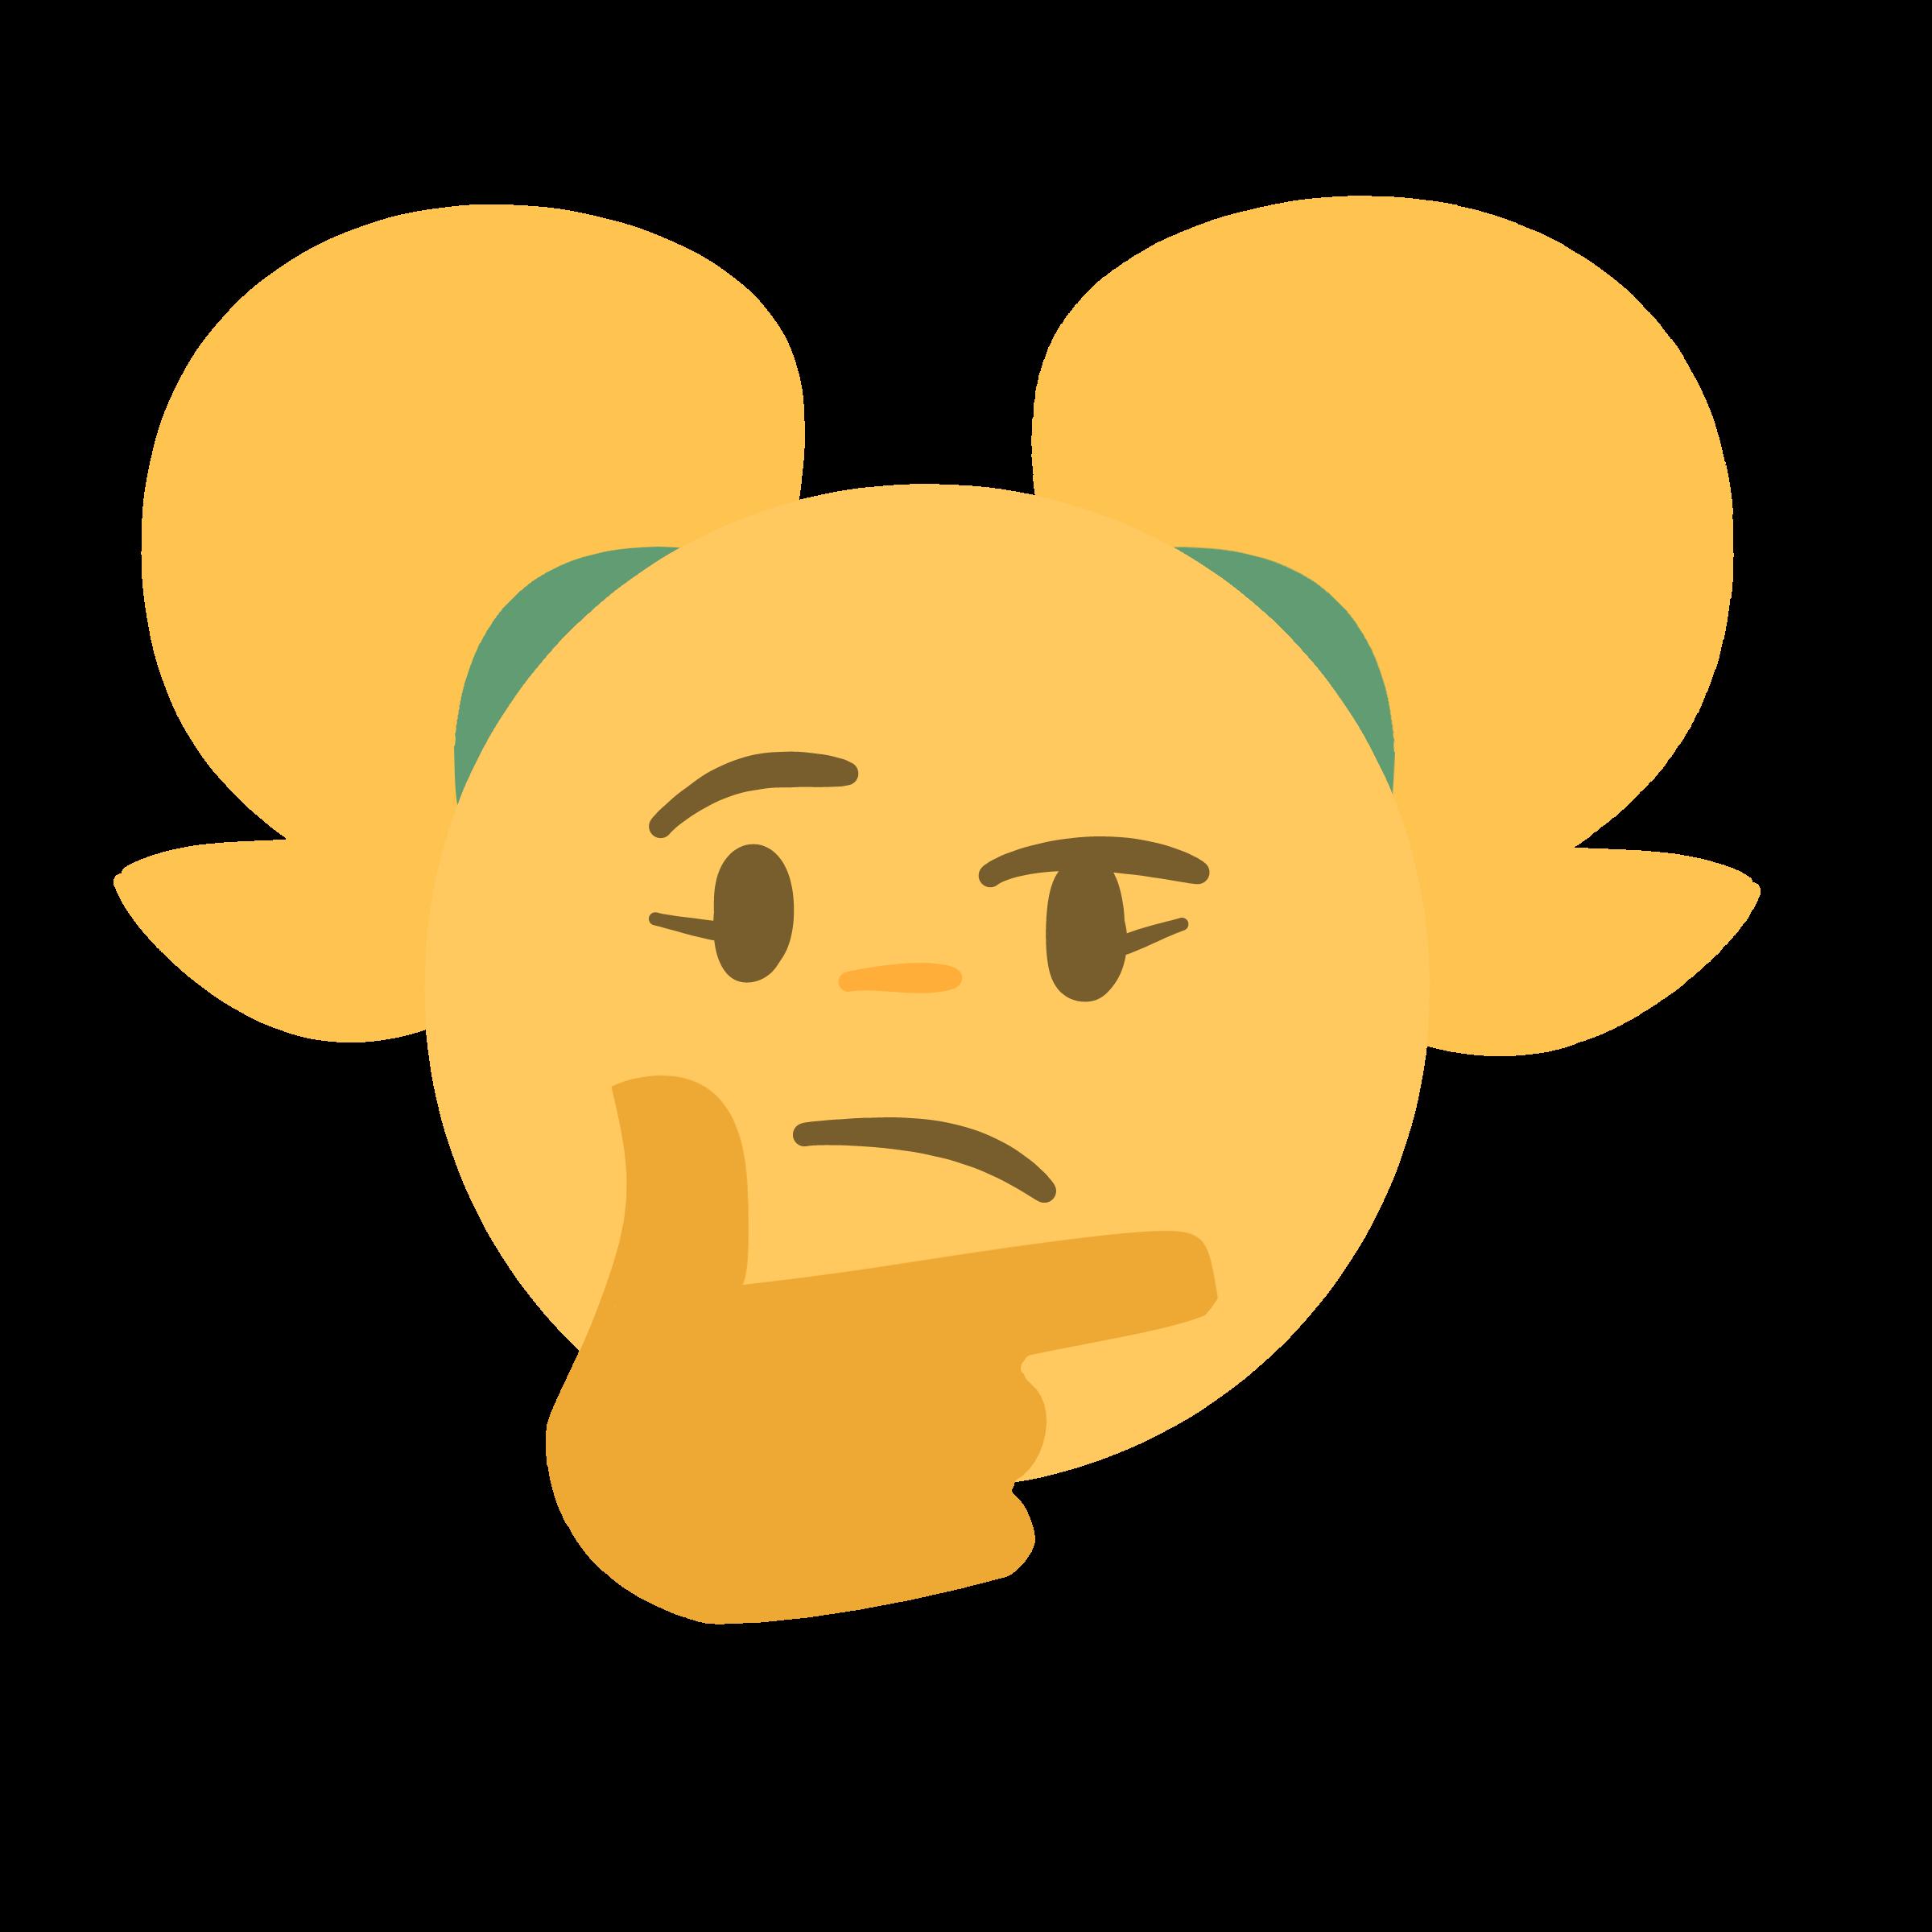 Thinking emoji b by sssir8 by SSlapper on Newgrounds